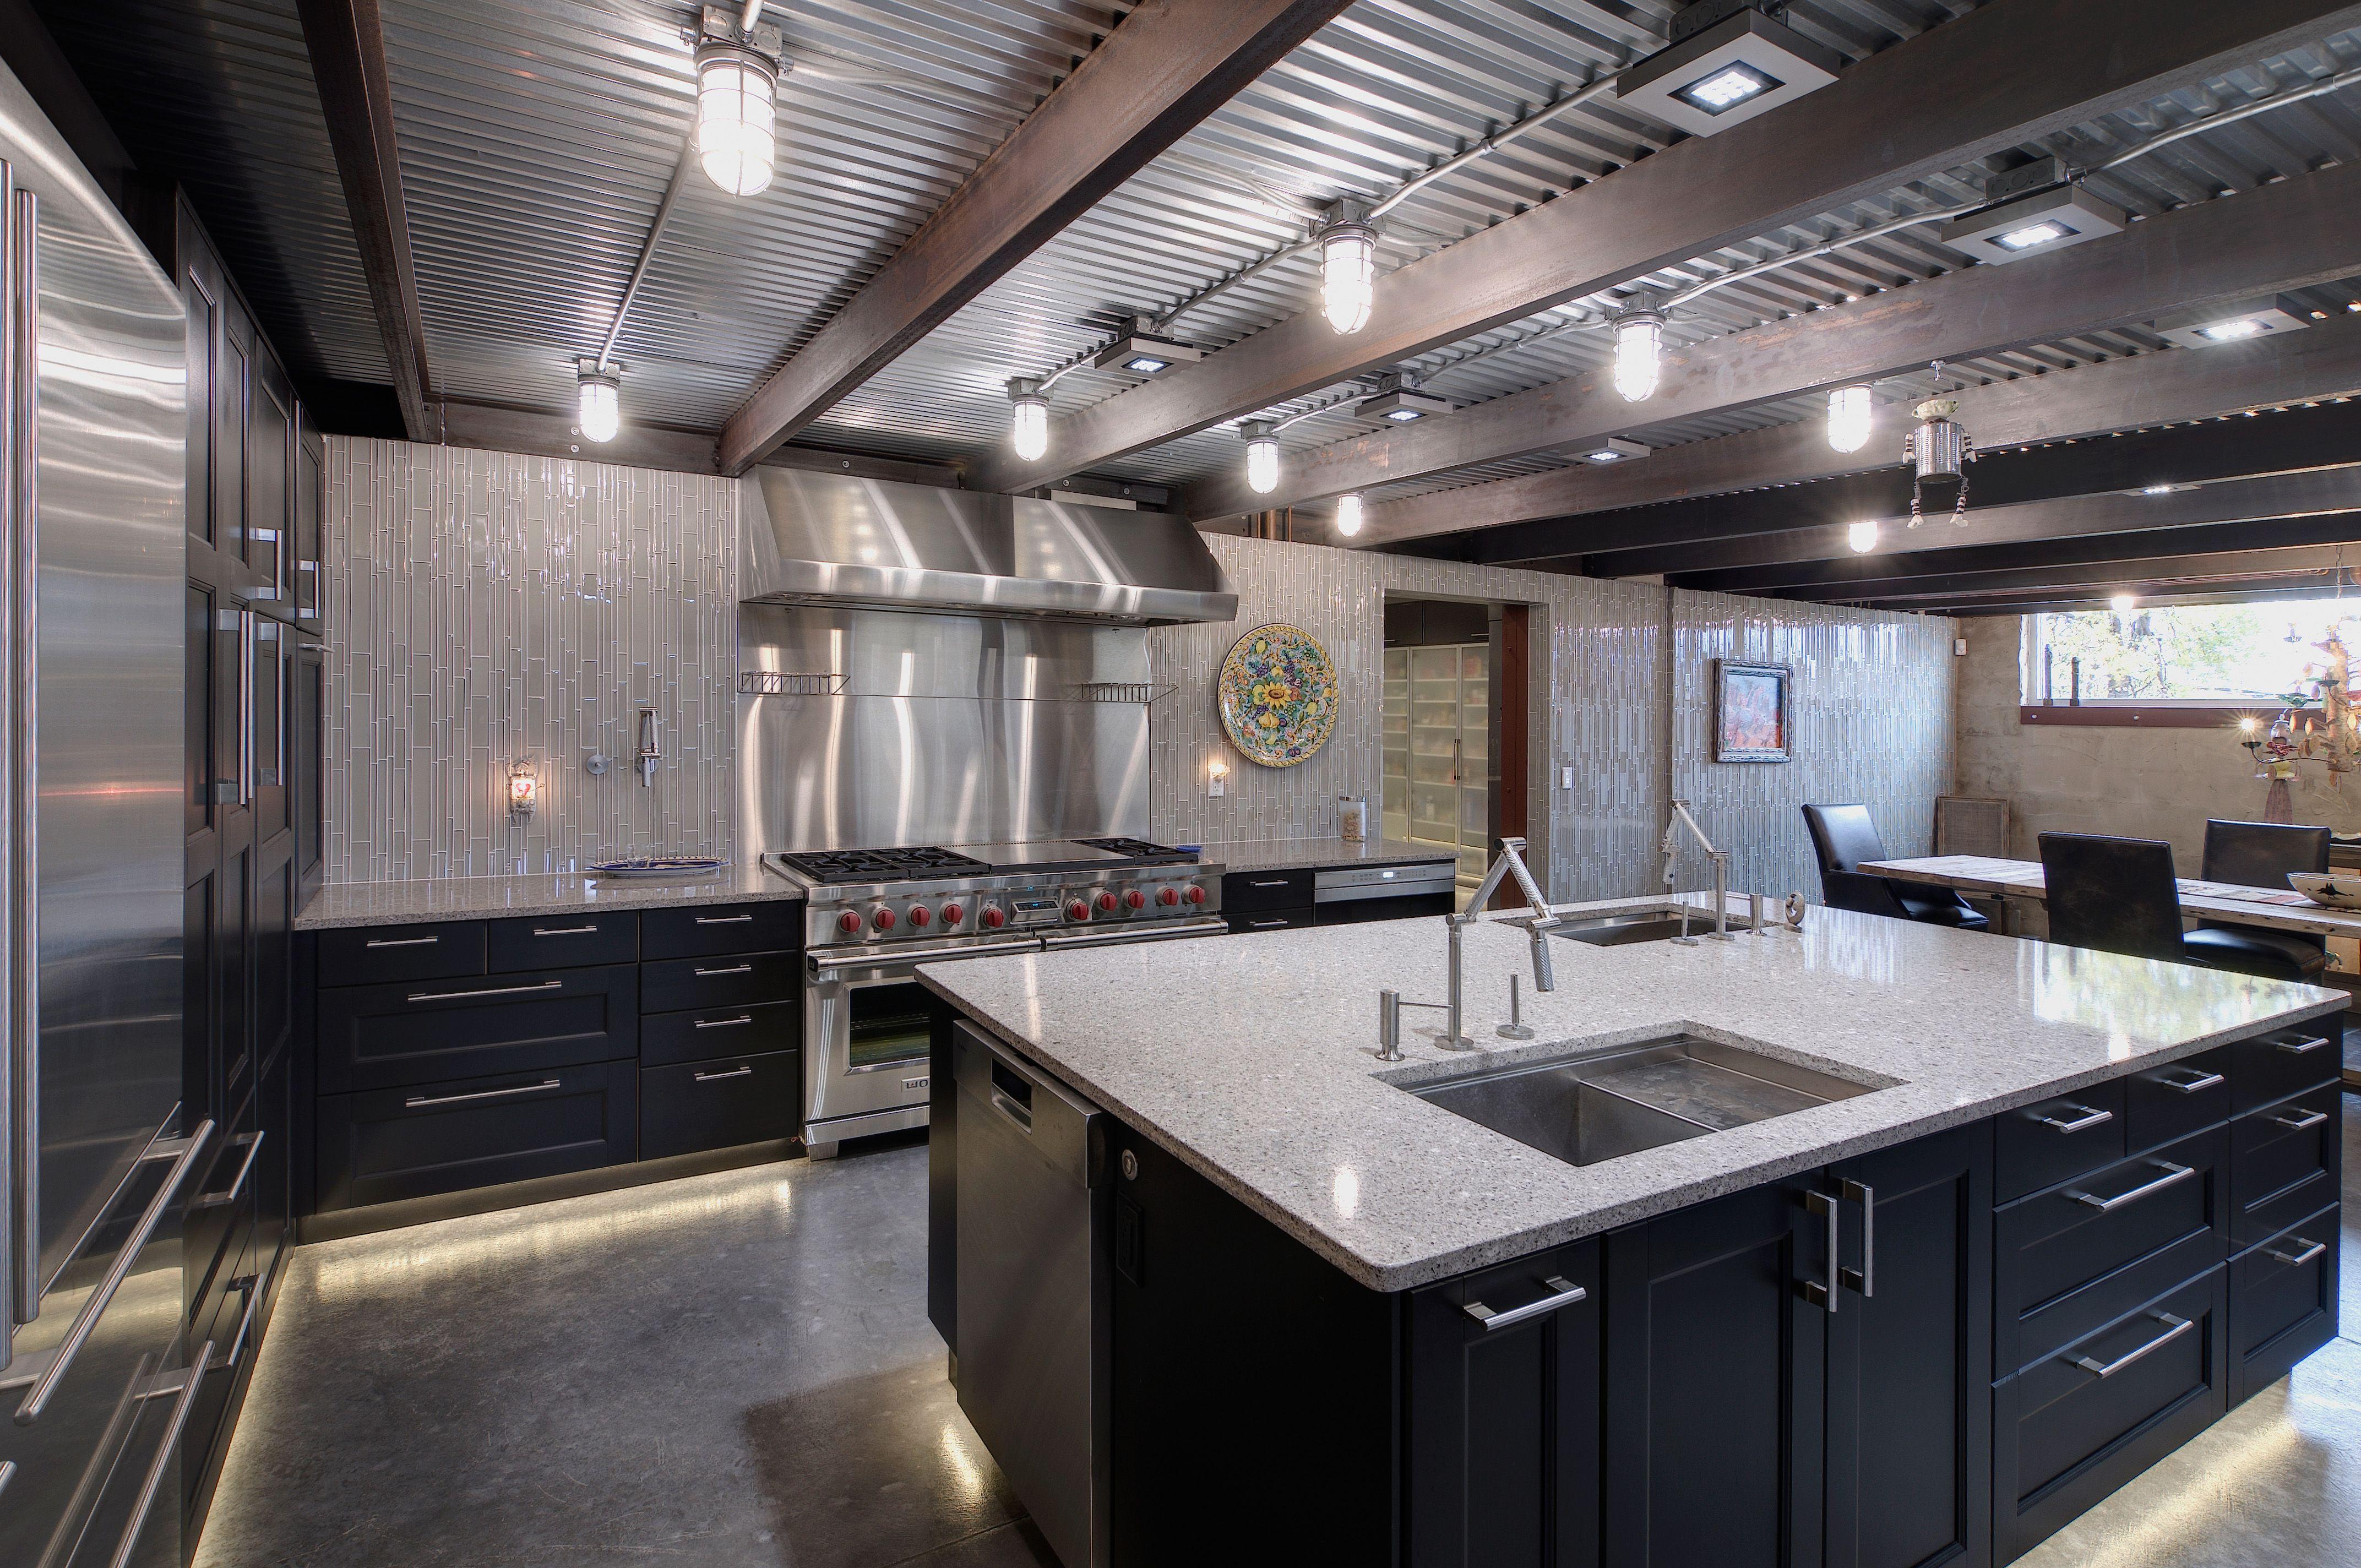 Polished Concrete Flooring Under Cabinet Lighting Along Floor Corrugated Aluminu Industrial Apartment Decor Kitchen Ceiling Lights Polished Concrete Flooring